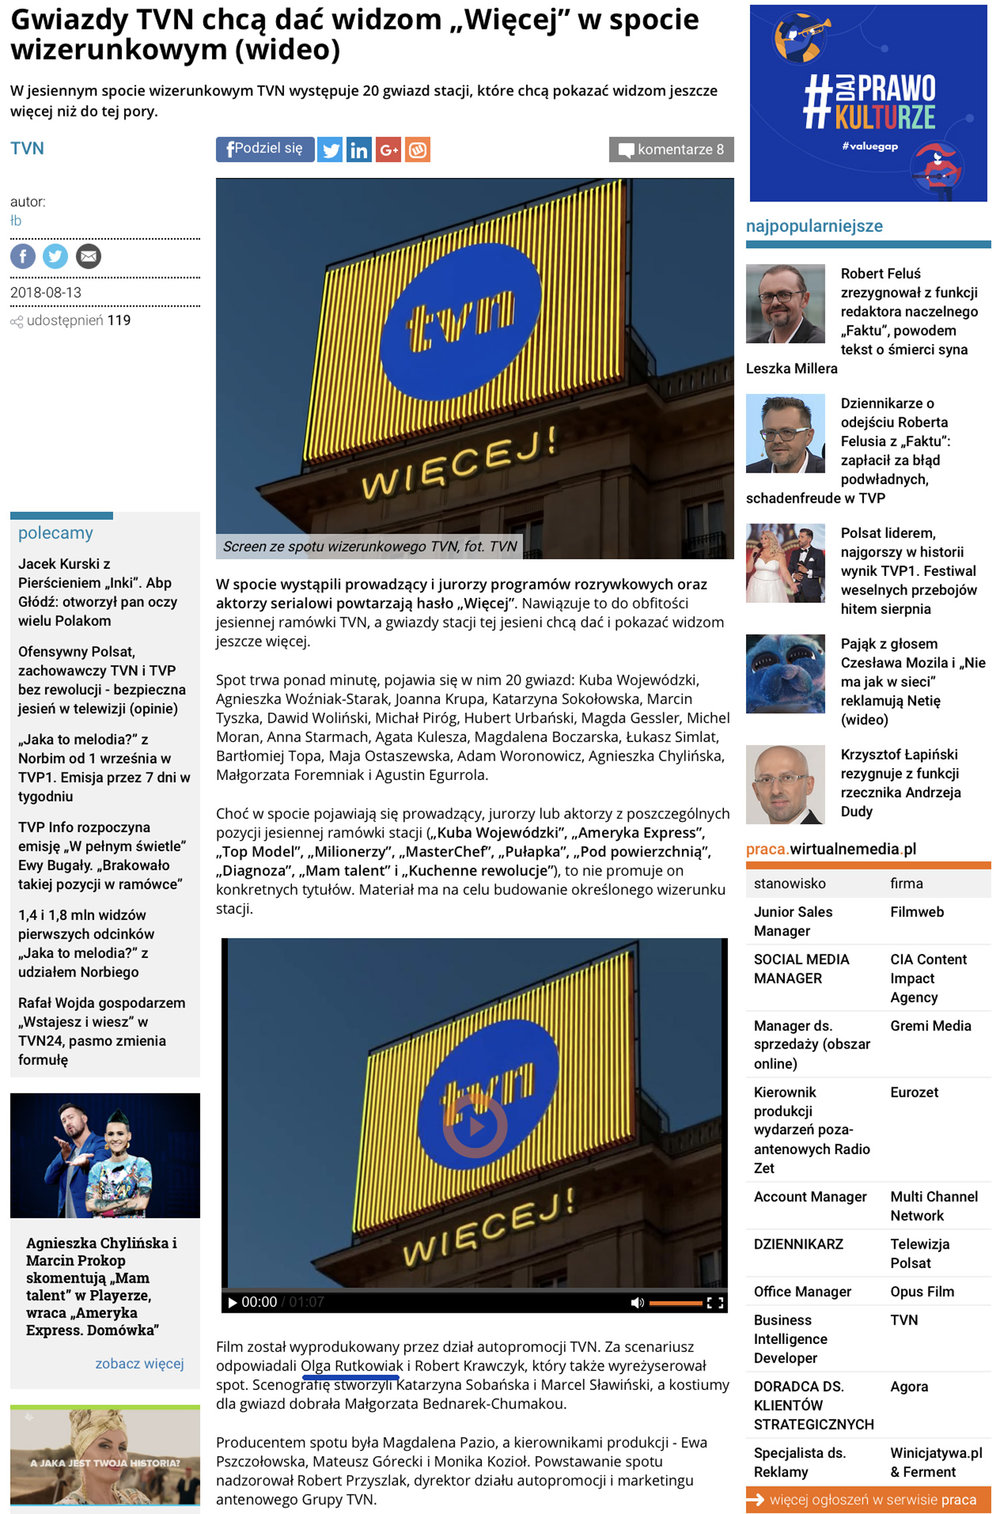 wirtualne media tvn Olga Rutkowiak top model pulapka